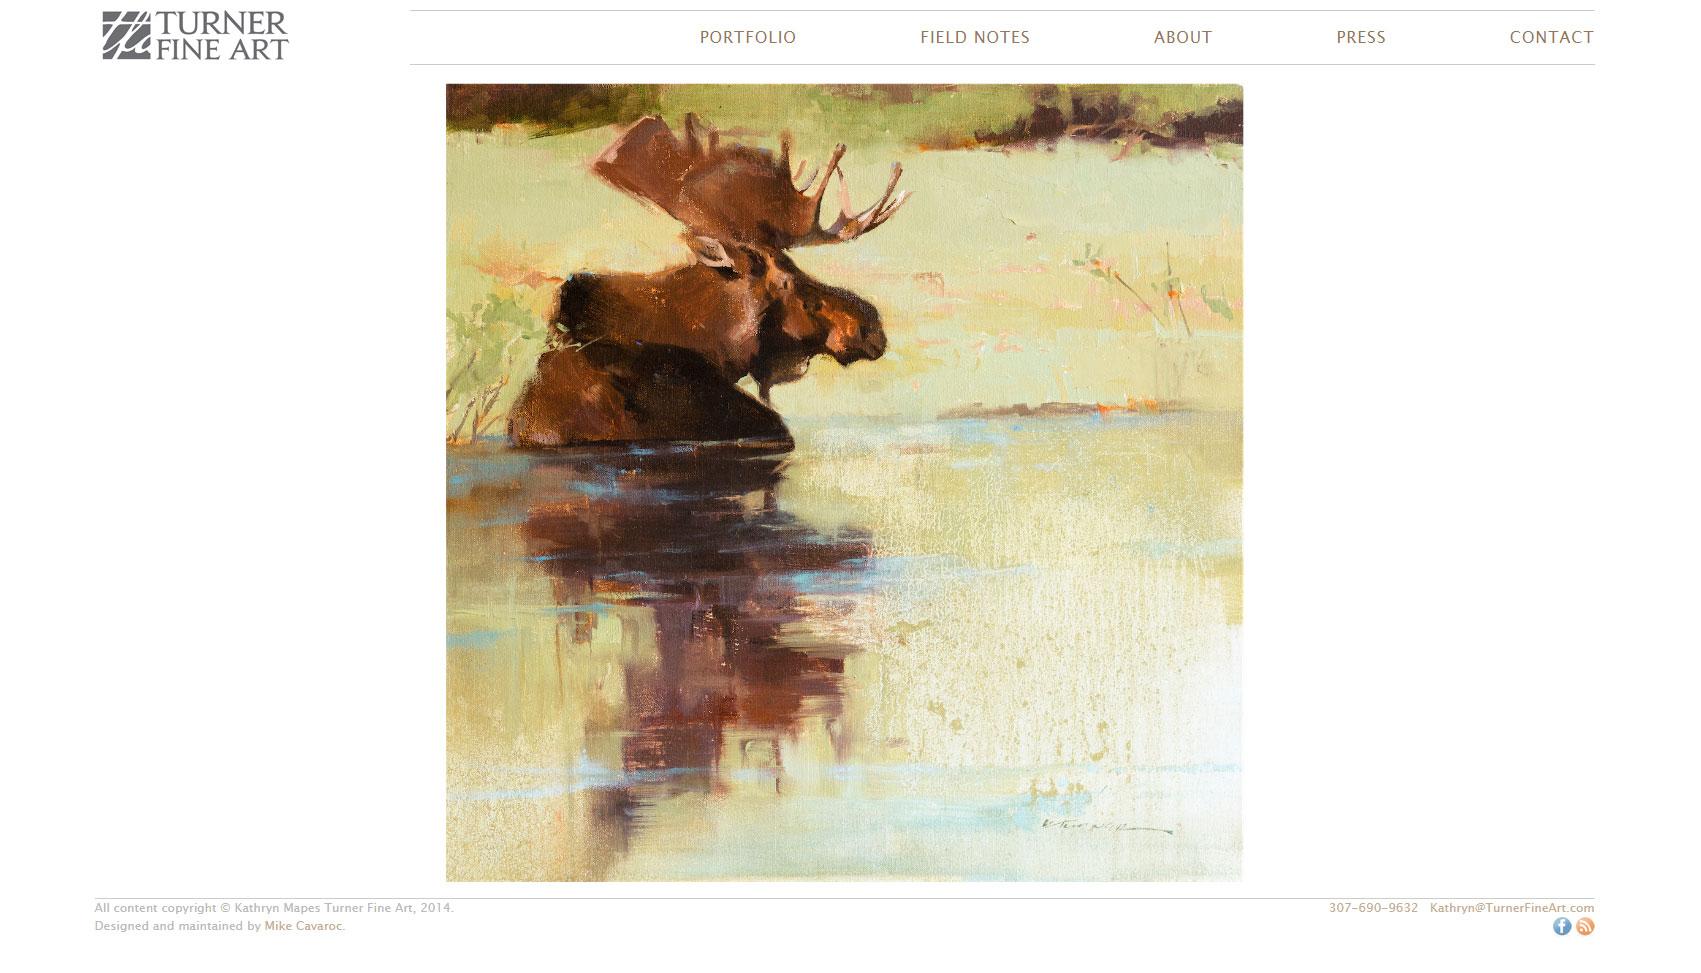 Turner Fine Art Website